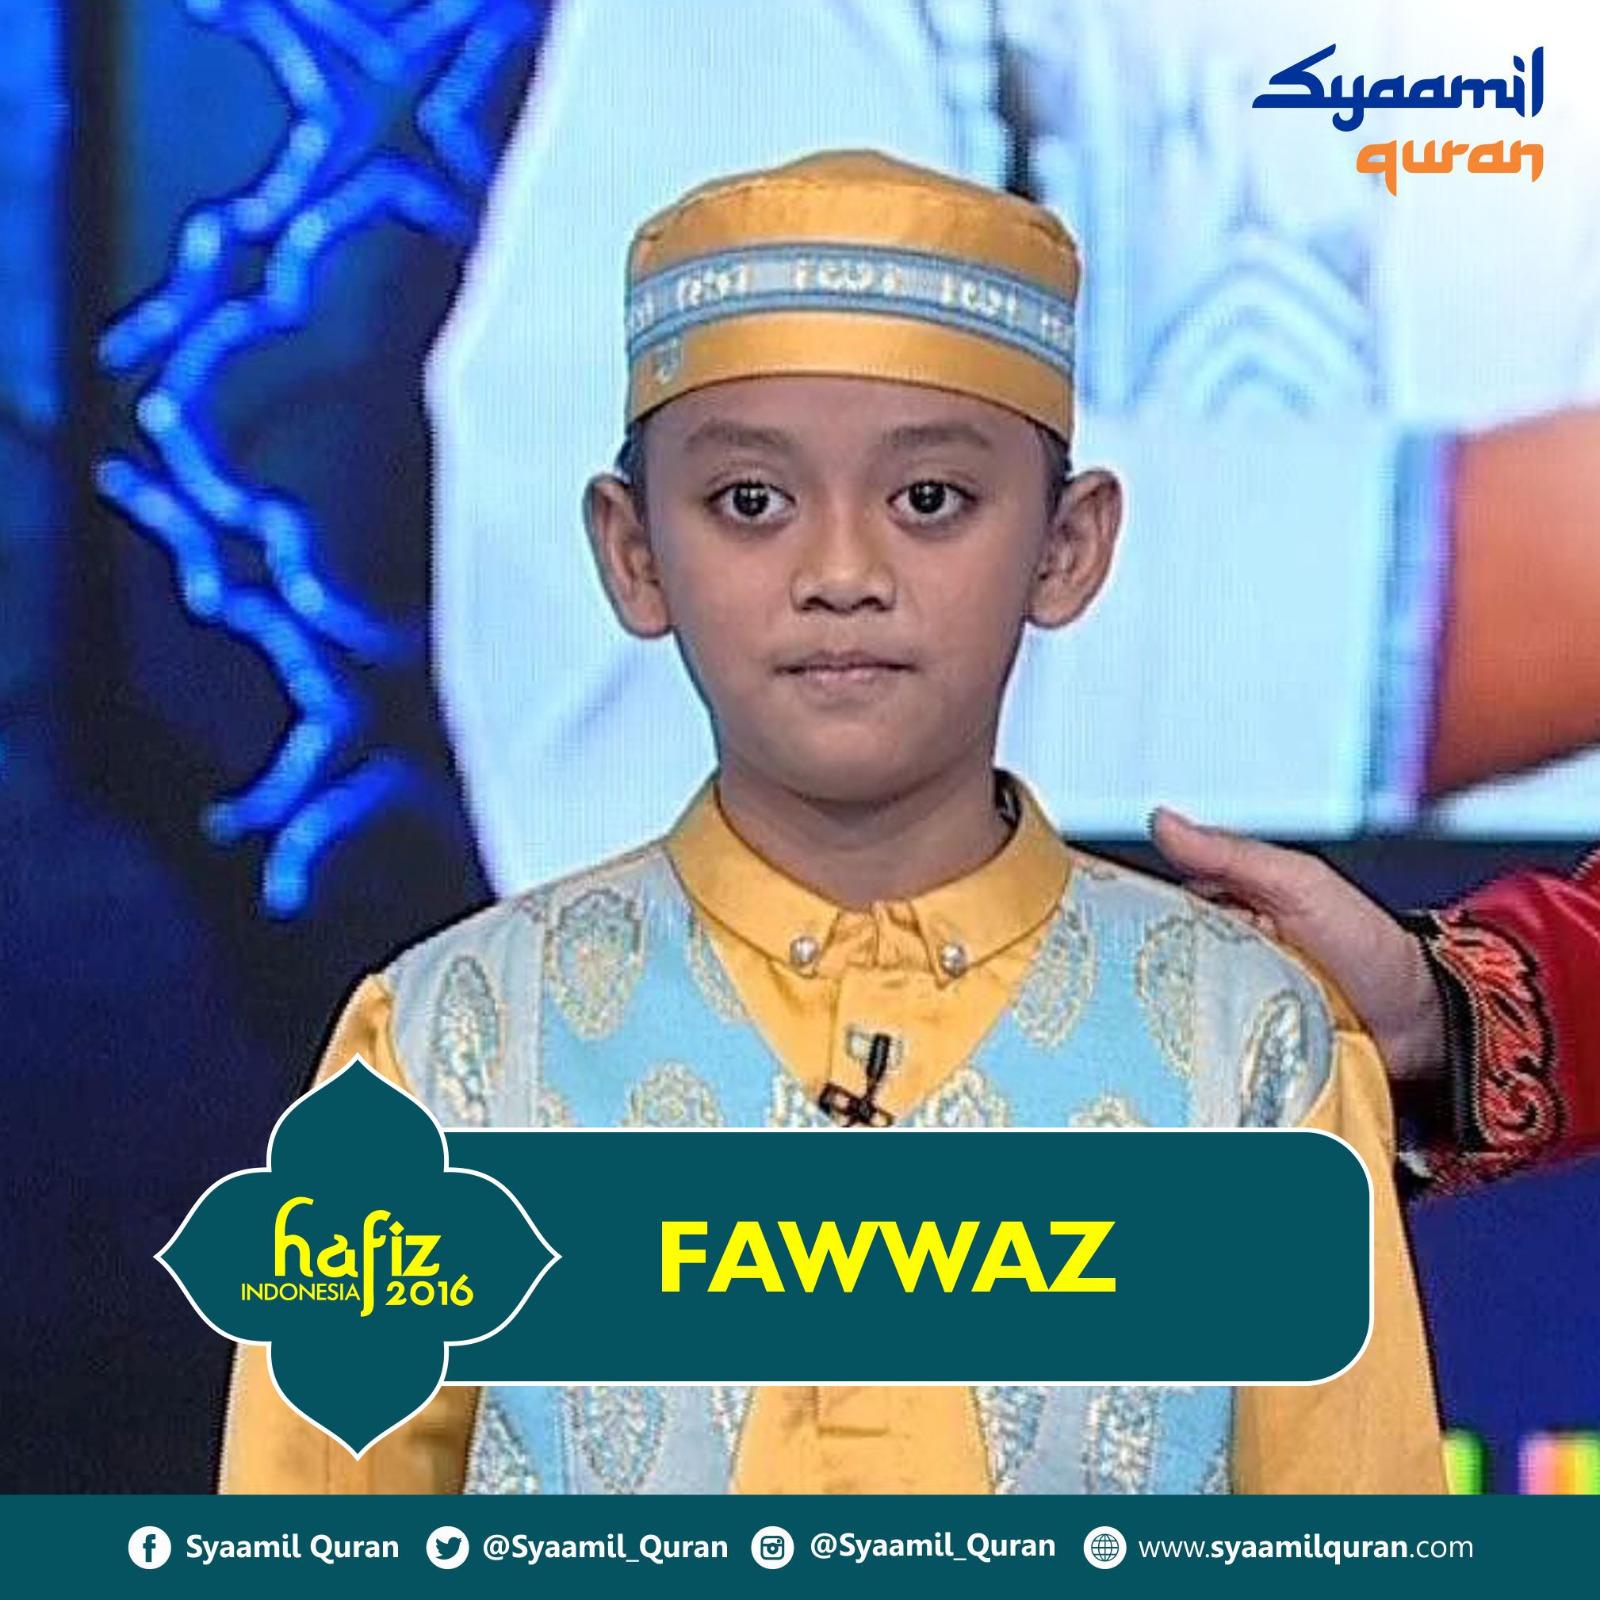 Fawwaz - Hafiz Indonesia 2016